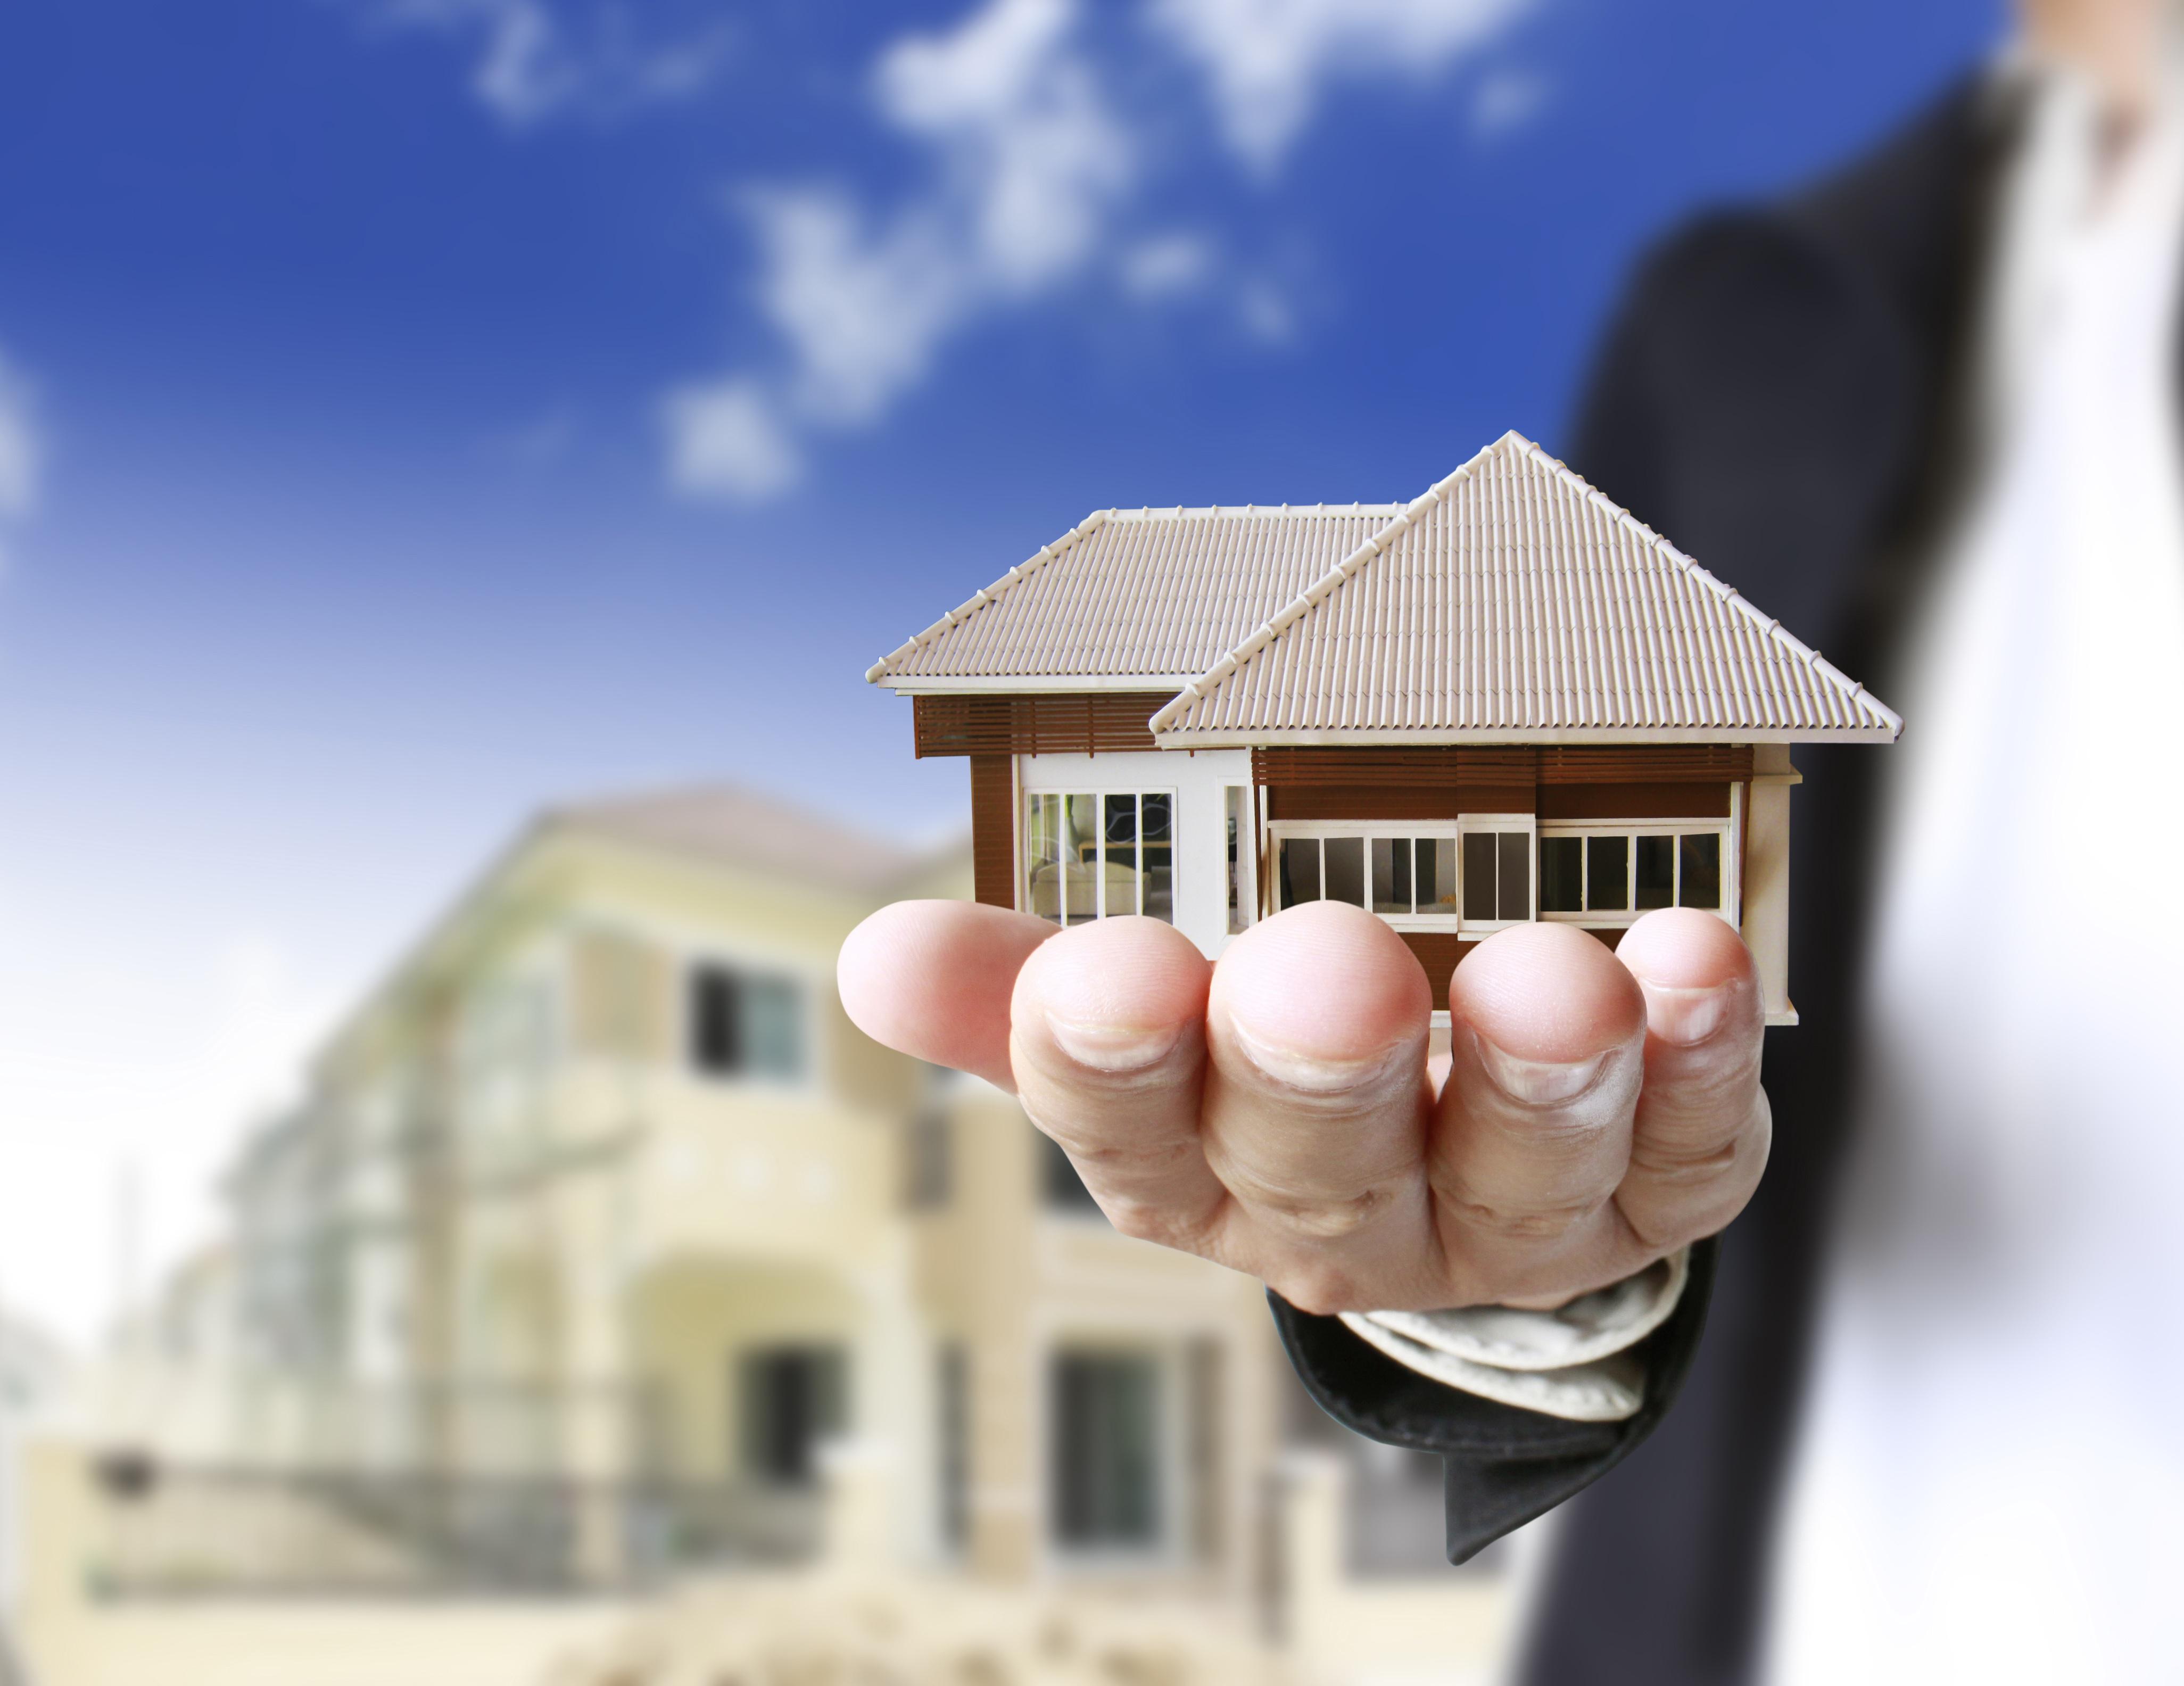 hand holding model of house